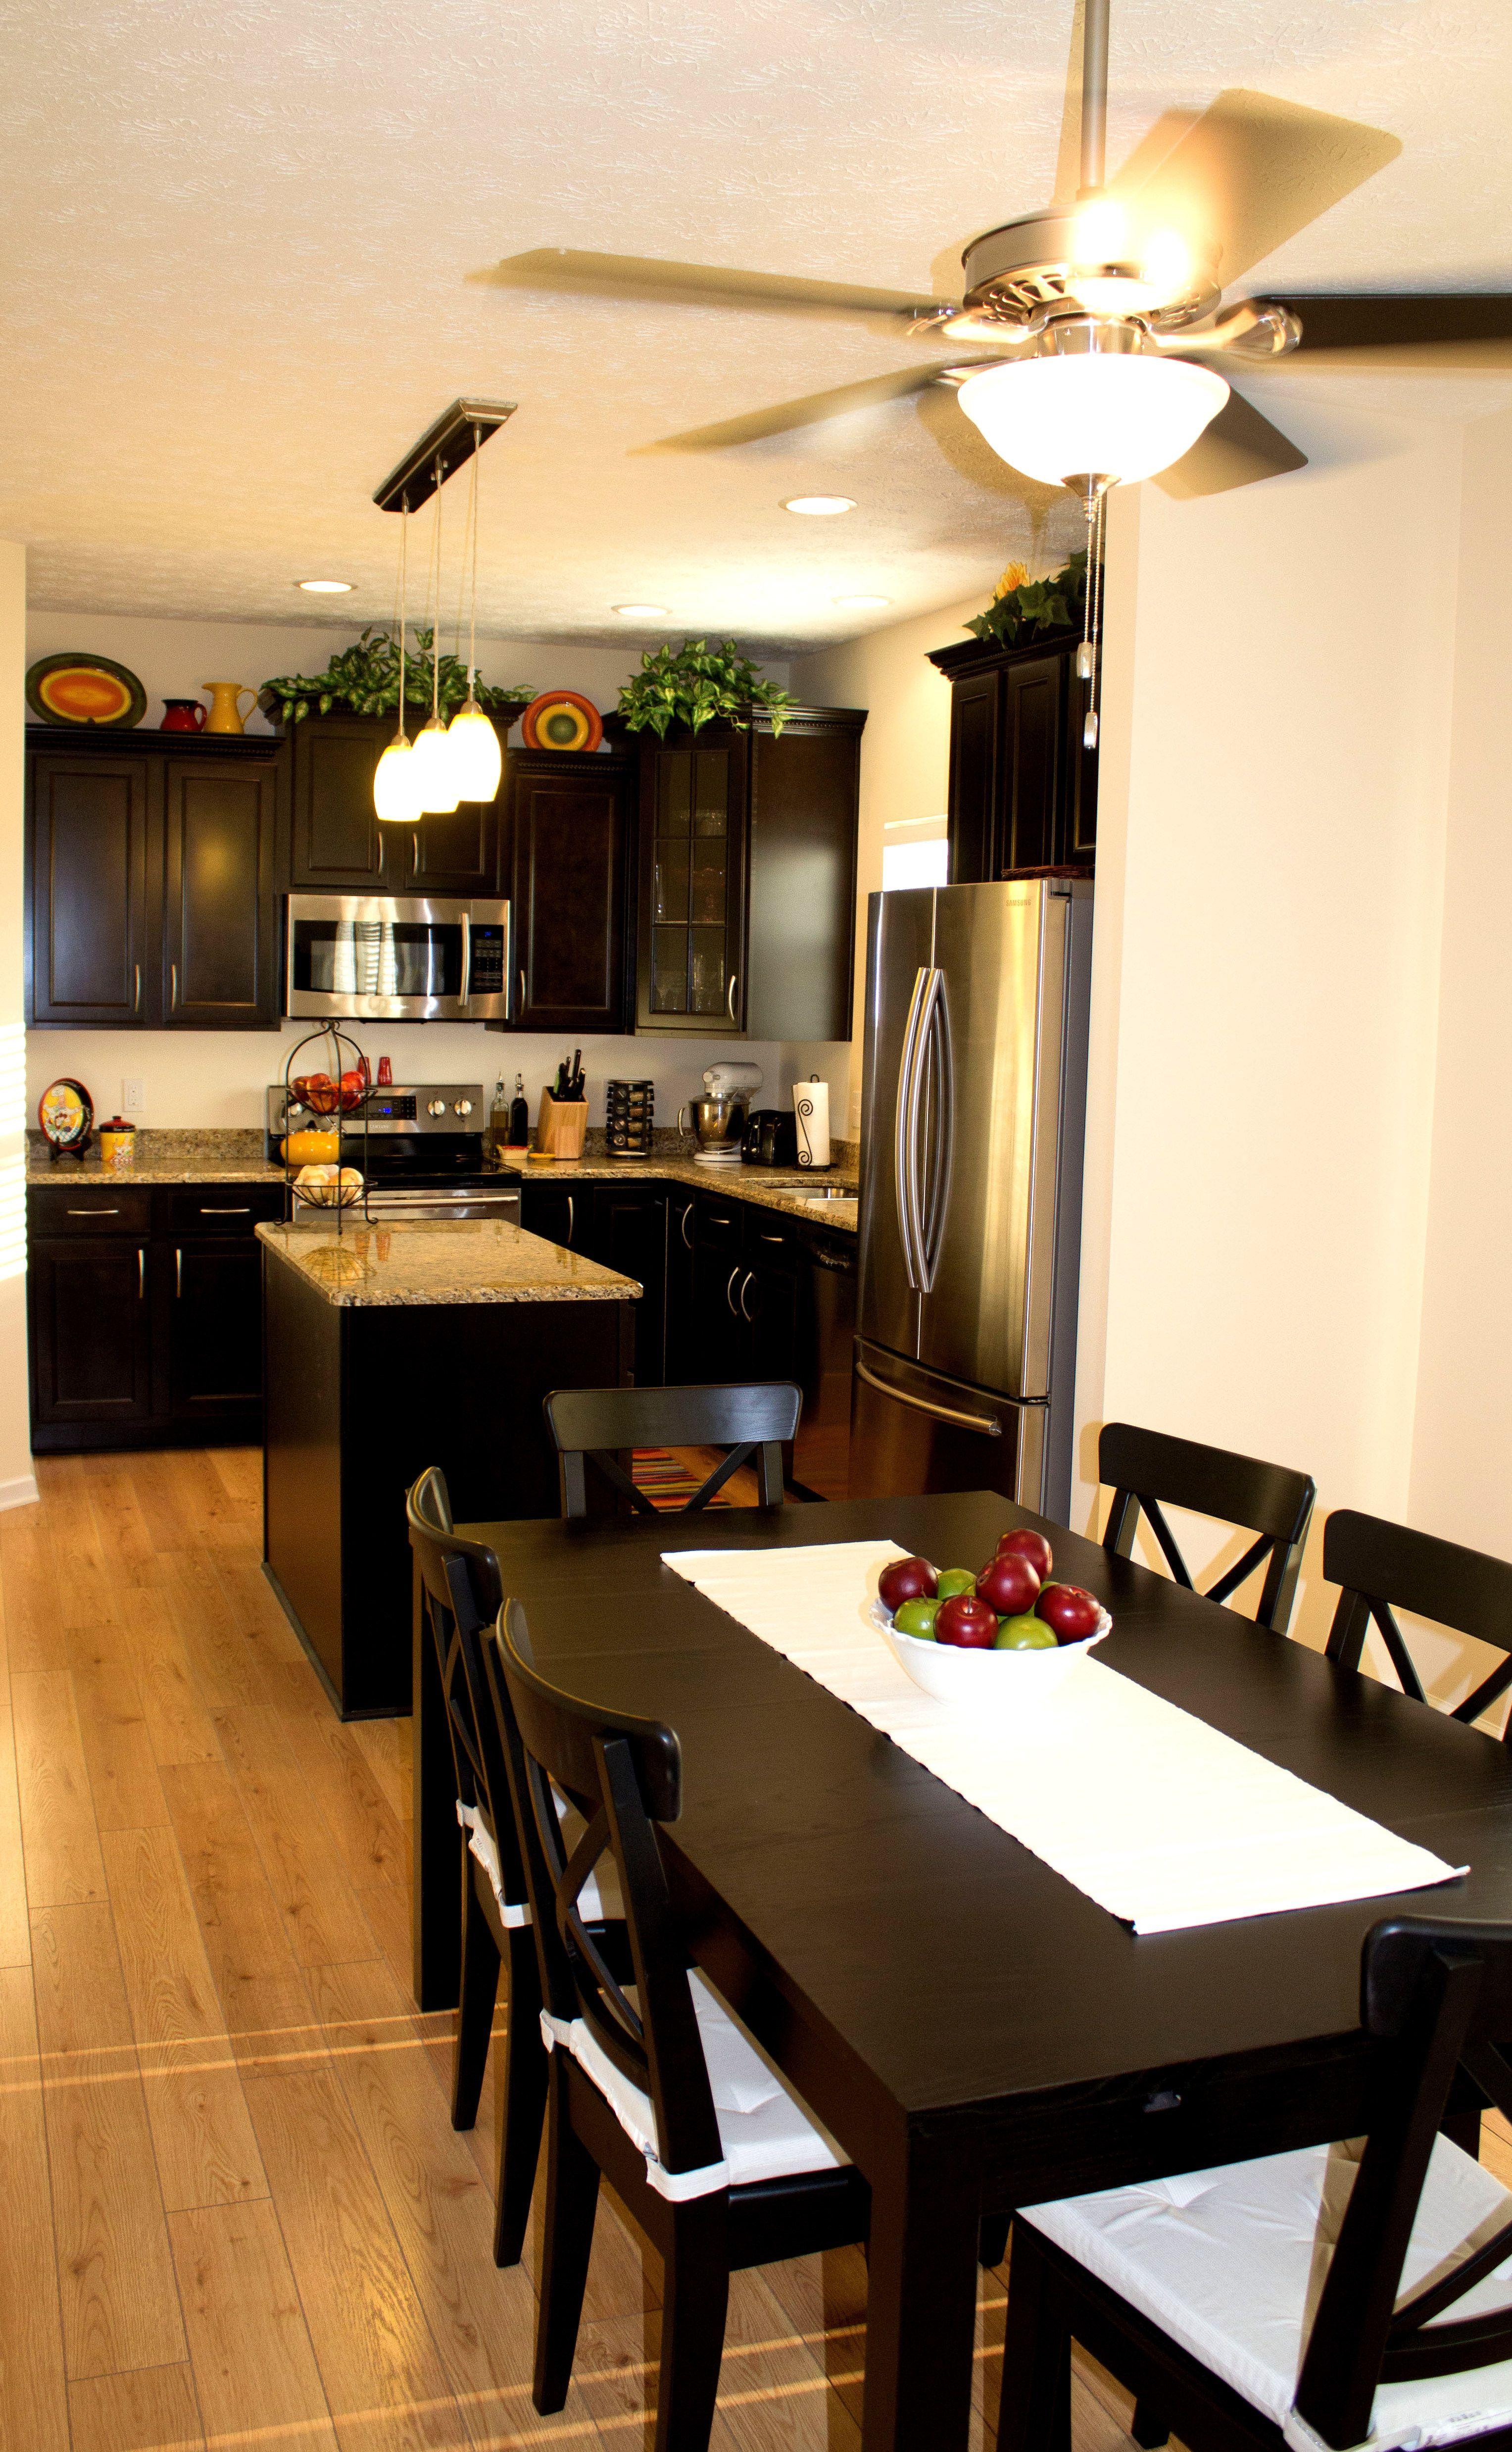 Espresso Kitchen Cabinets With Stainless Steel Appliances Budget Kitchen Remodel Espresso Kitchen Cabinets New Kitchen Cabinets